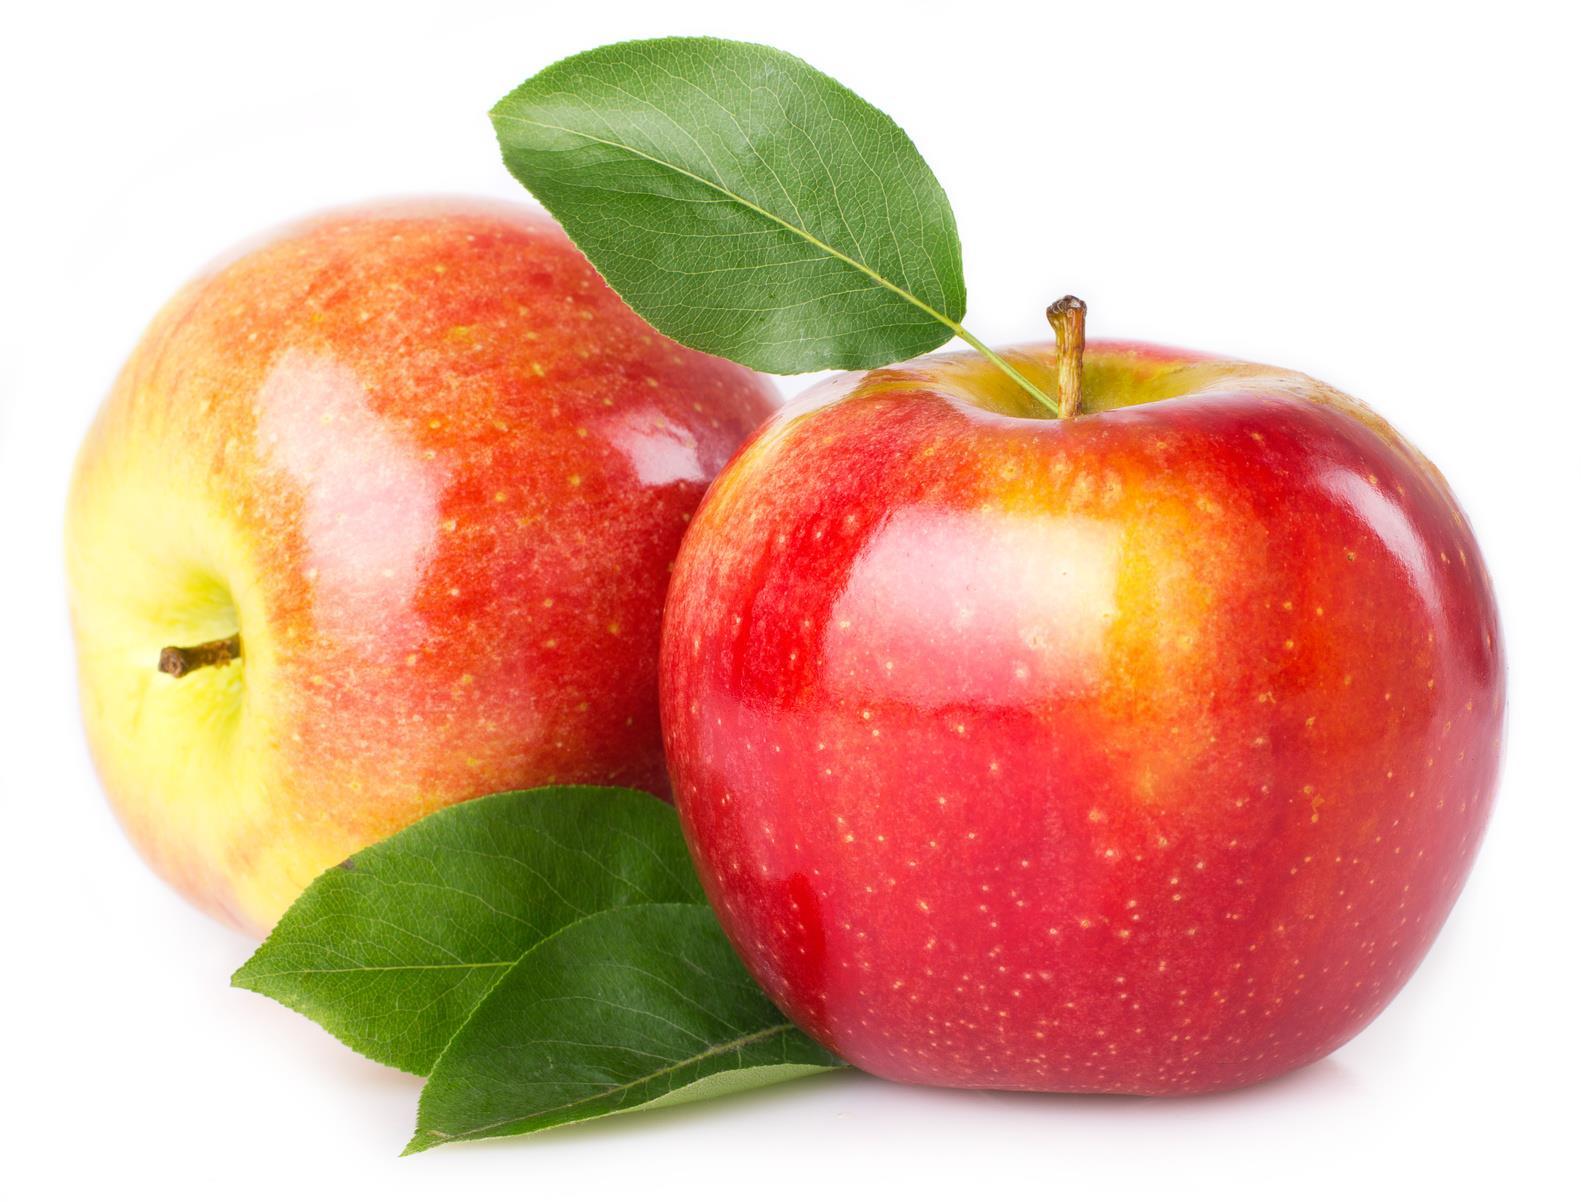 Elmasıyla Ünlü İlimiz Hangisidir